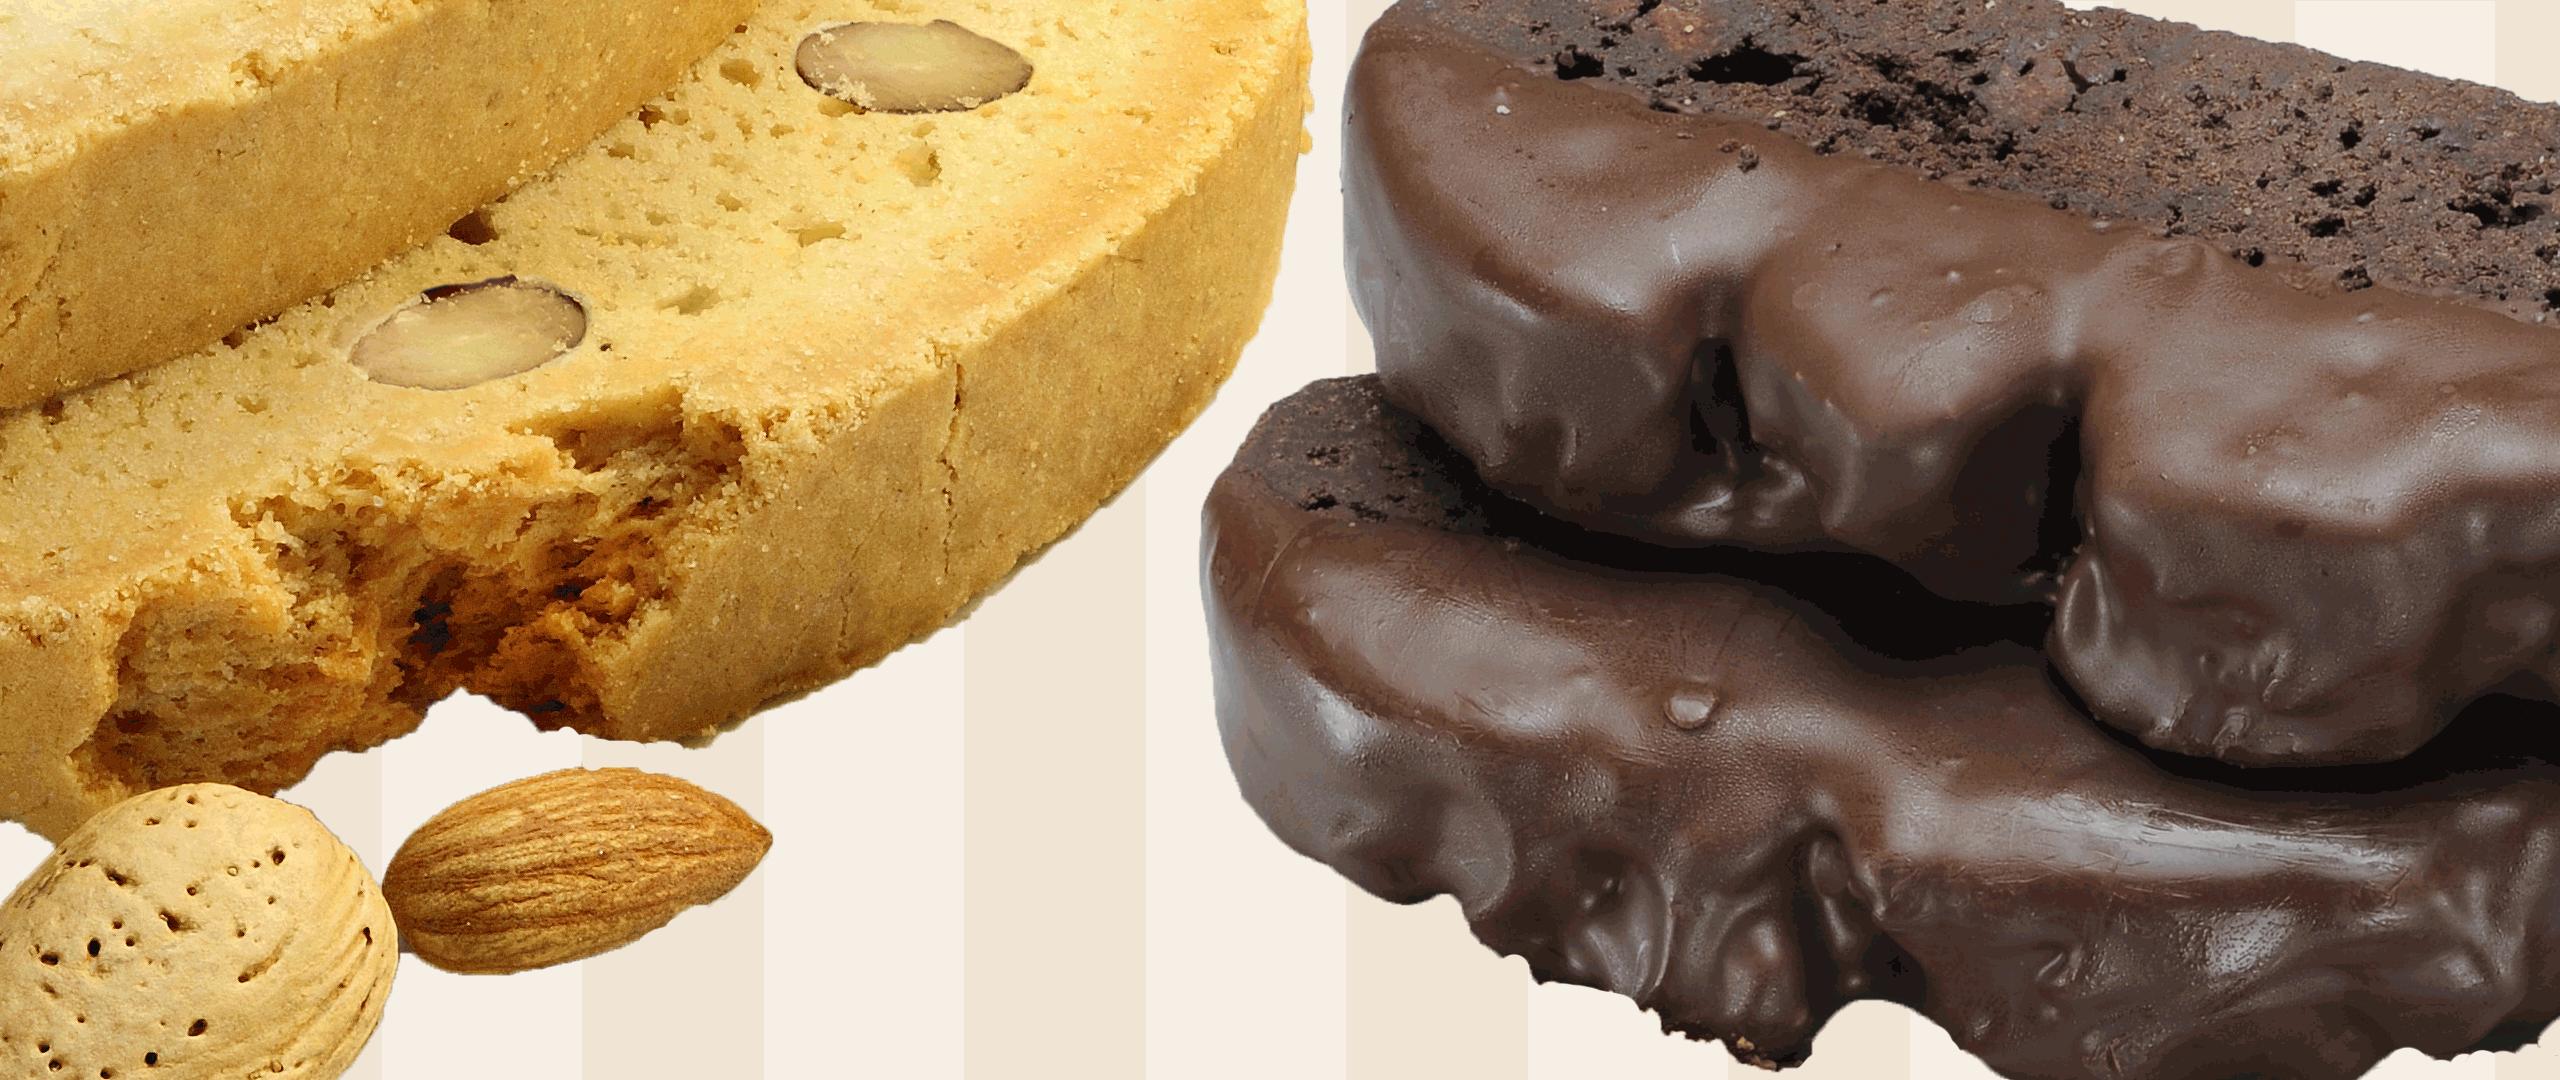 Mezzaluna Biscotti Company | The Best Biscotti